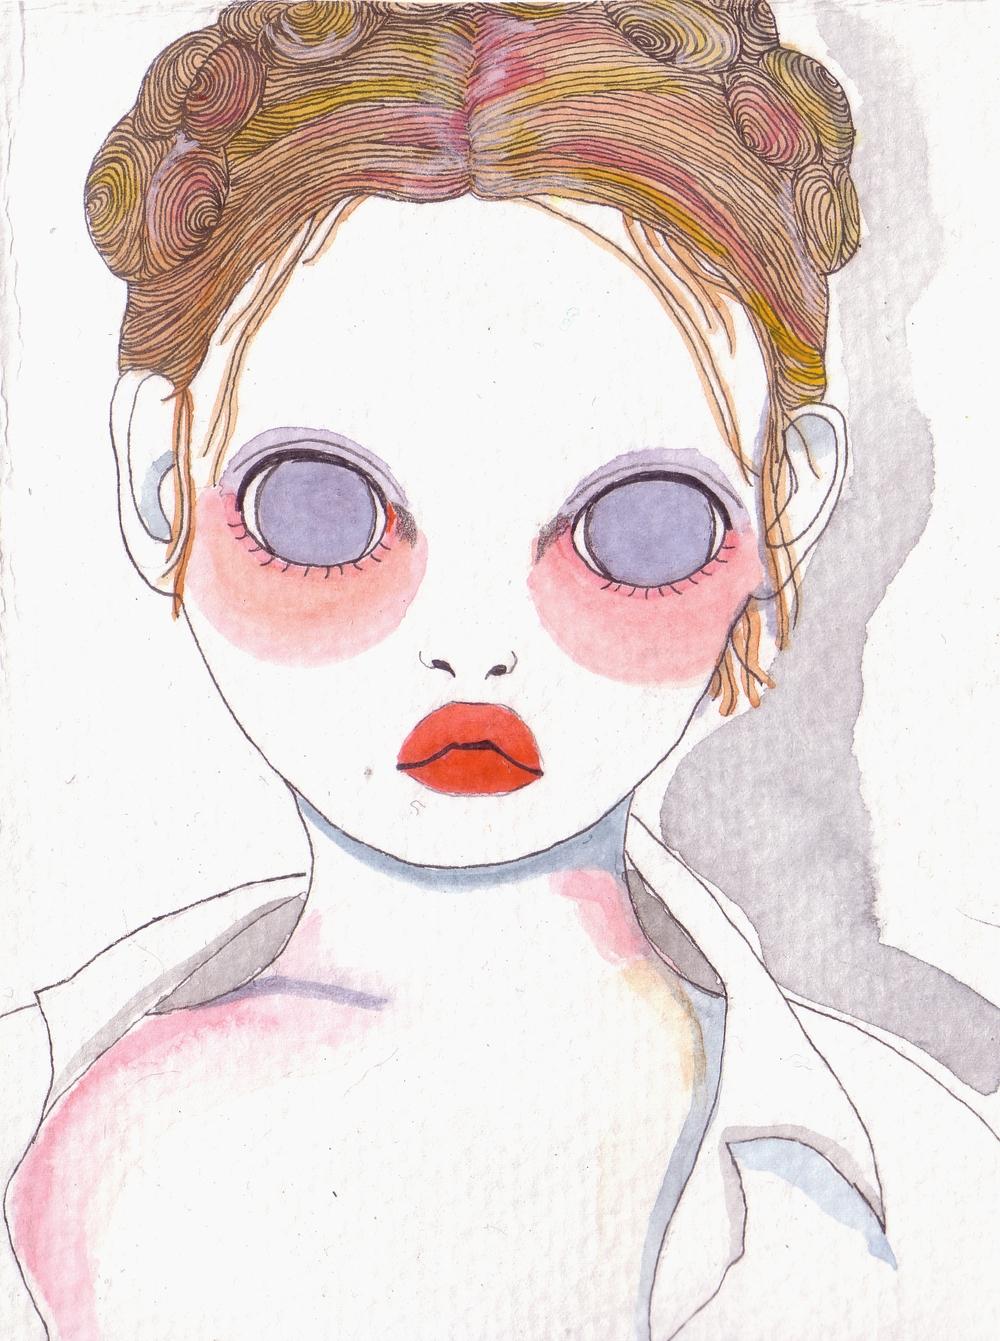 Lolita #1